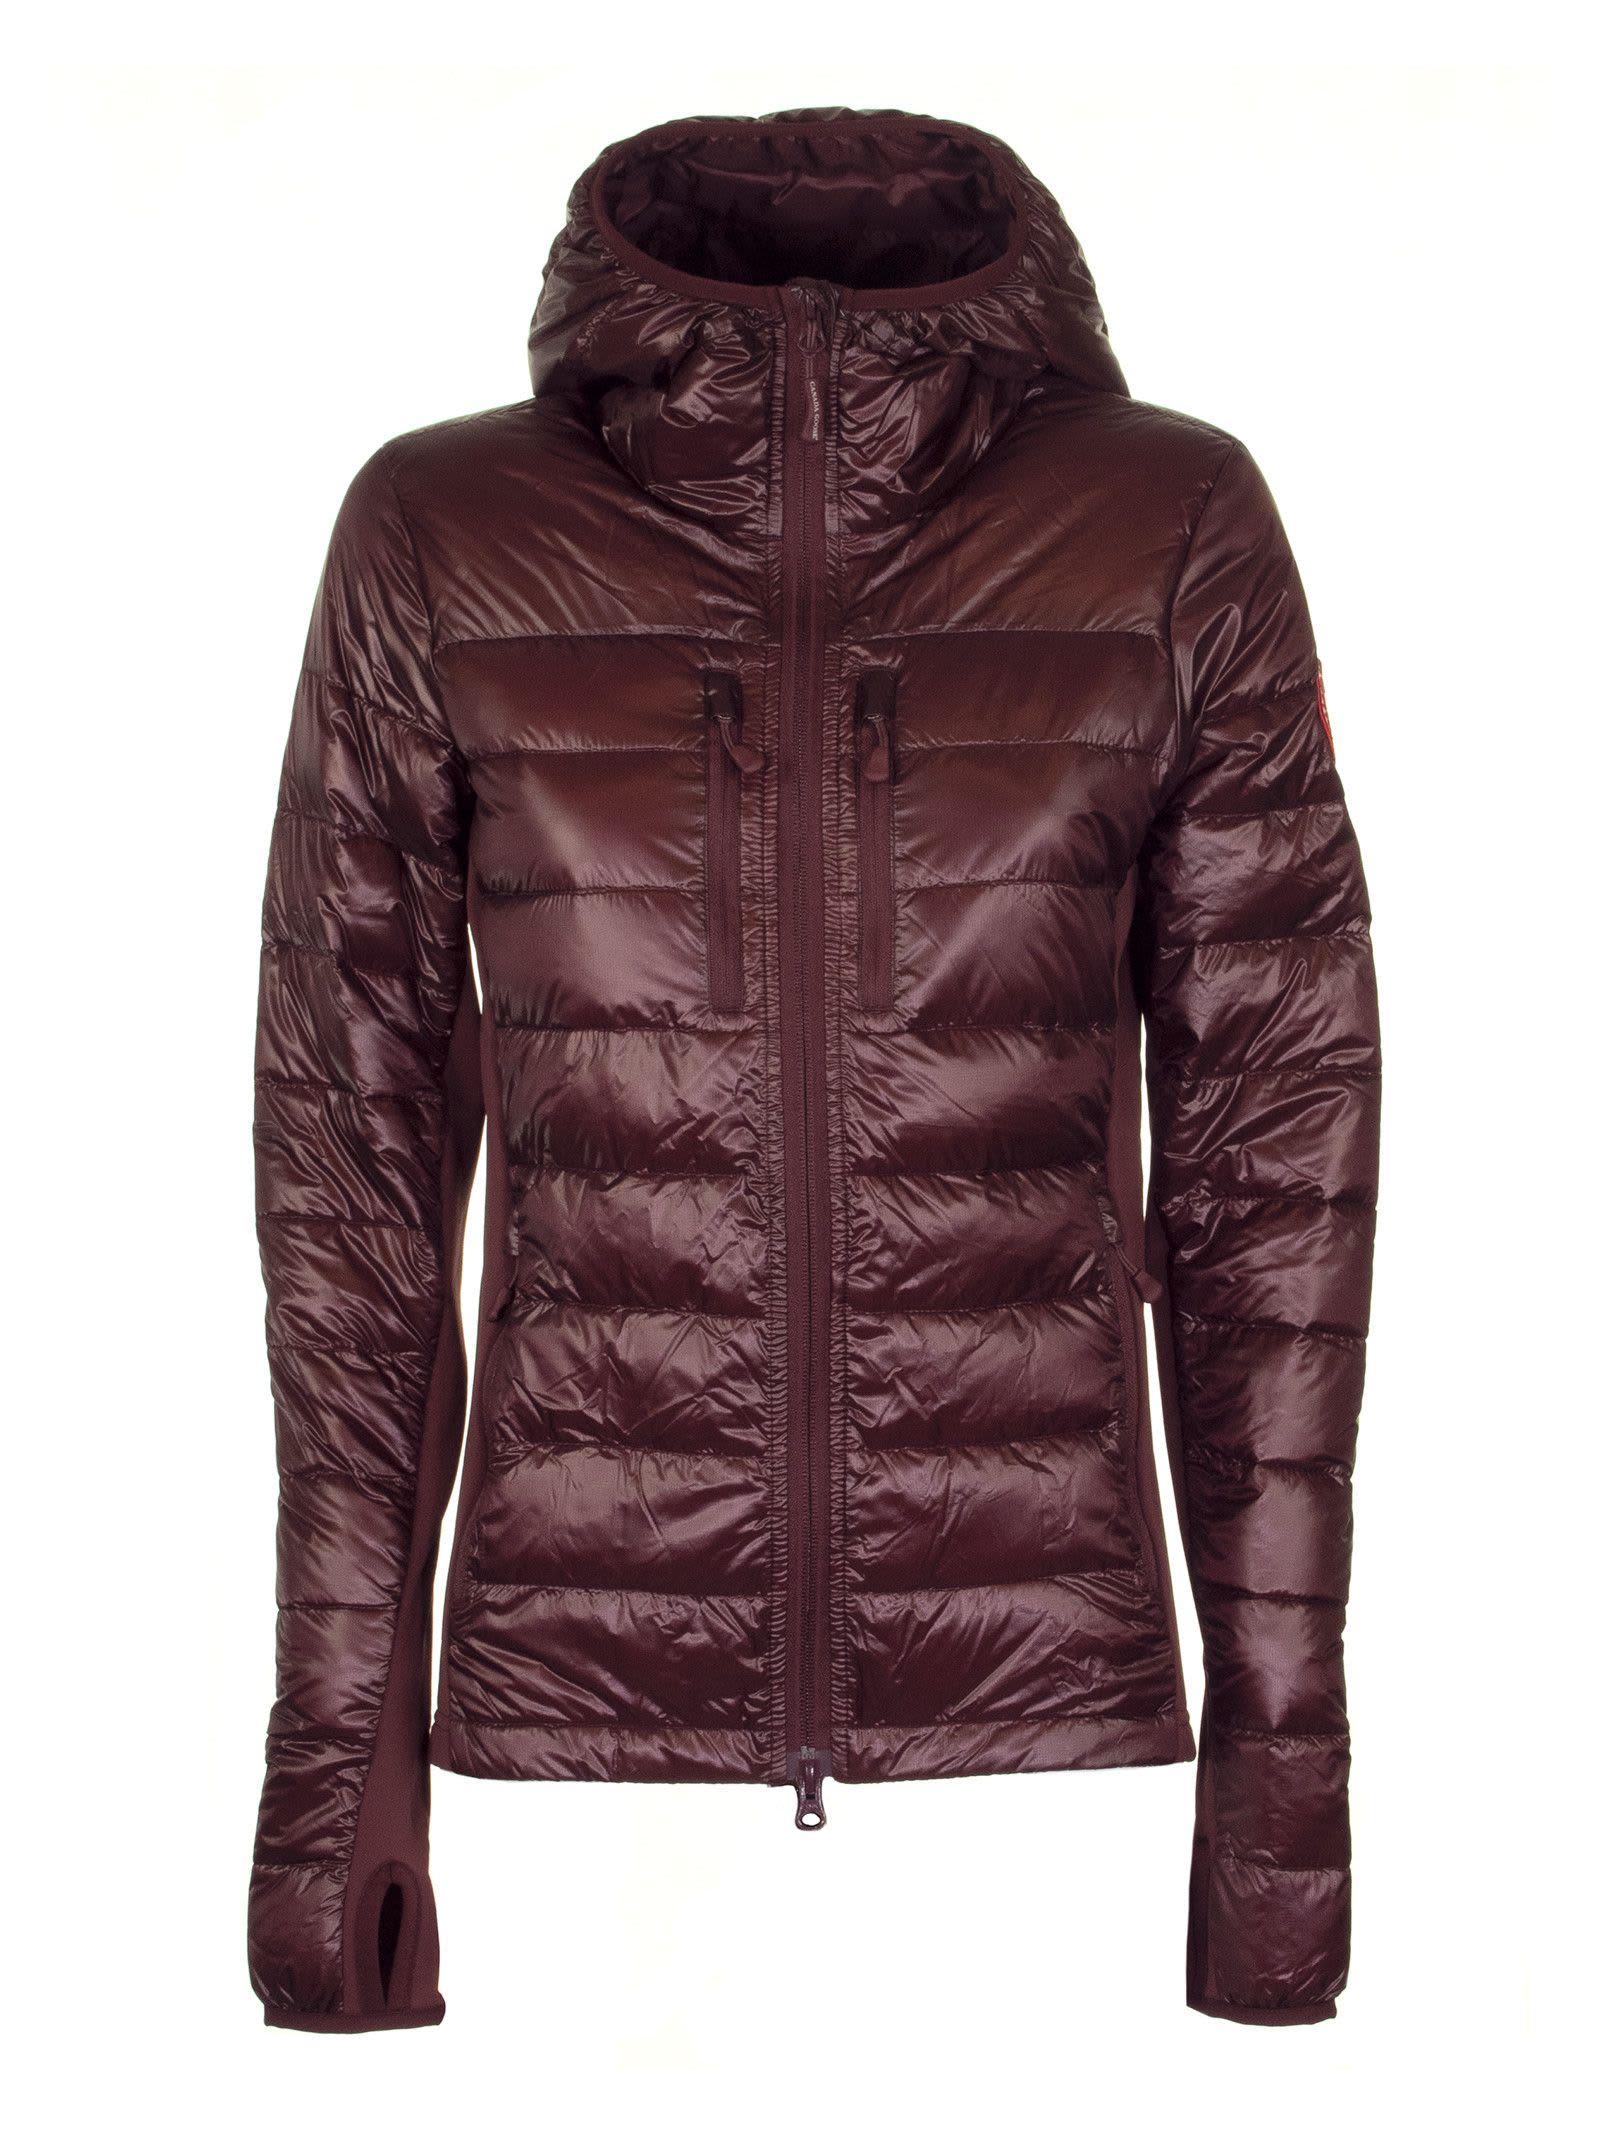 Canada Goose Elderberry Jacket